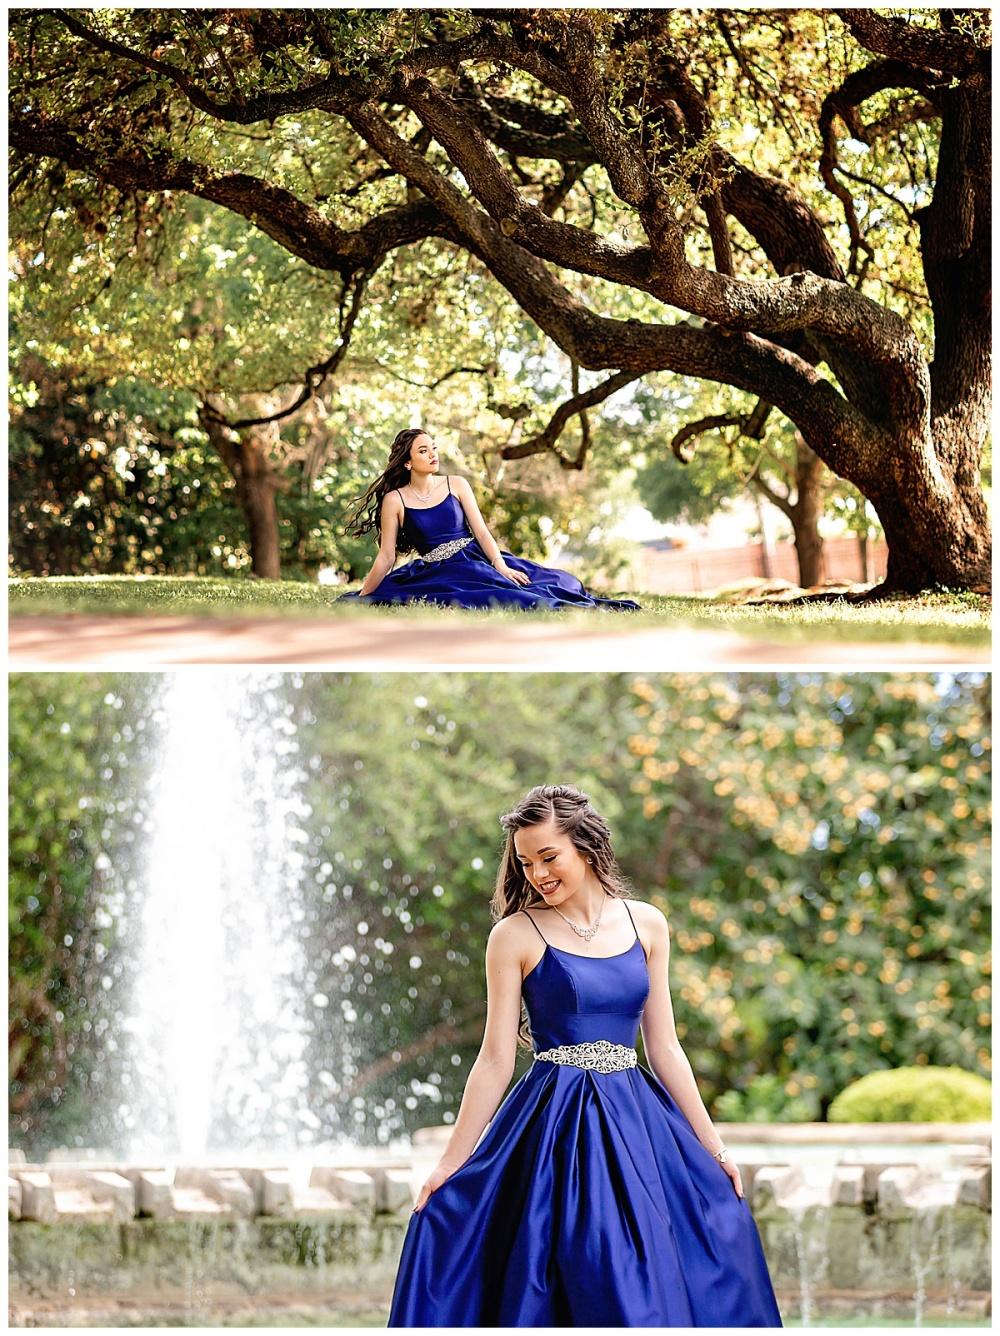 Family-Photographer-San-Antonio-Texas-McNay-Art-Museum-Sweet-16-Carly-Barton-Photography_0006.jpg